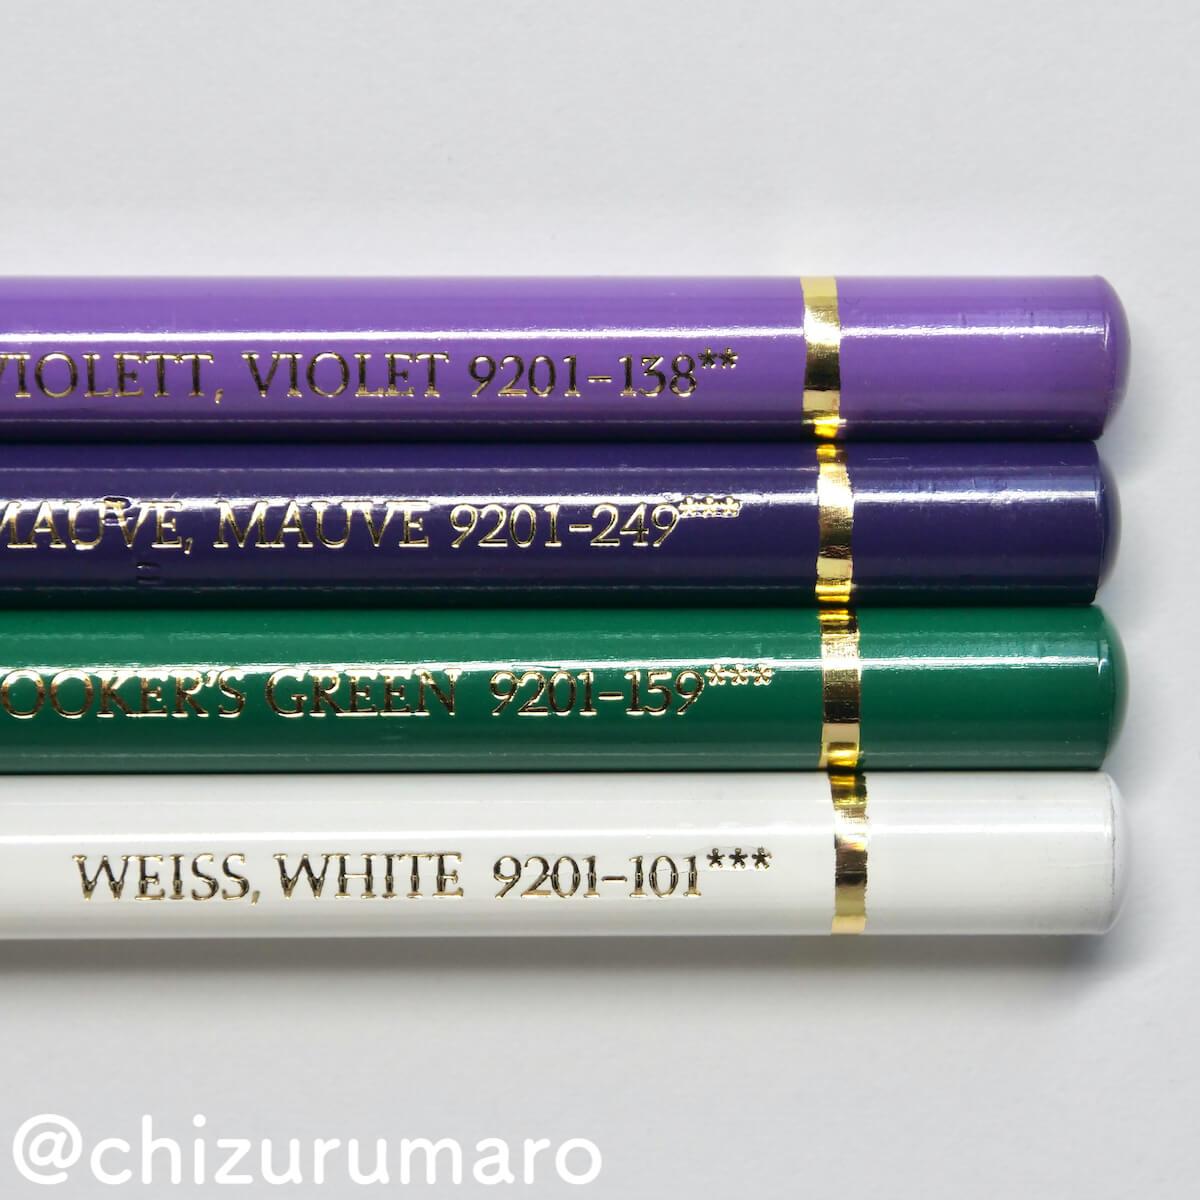 f:id:chizurumaro:20210805140113j:plain